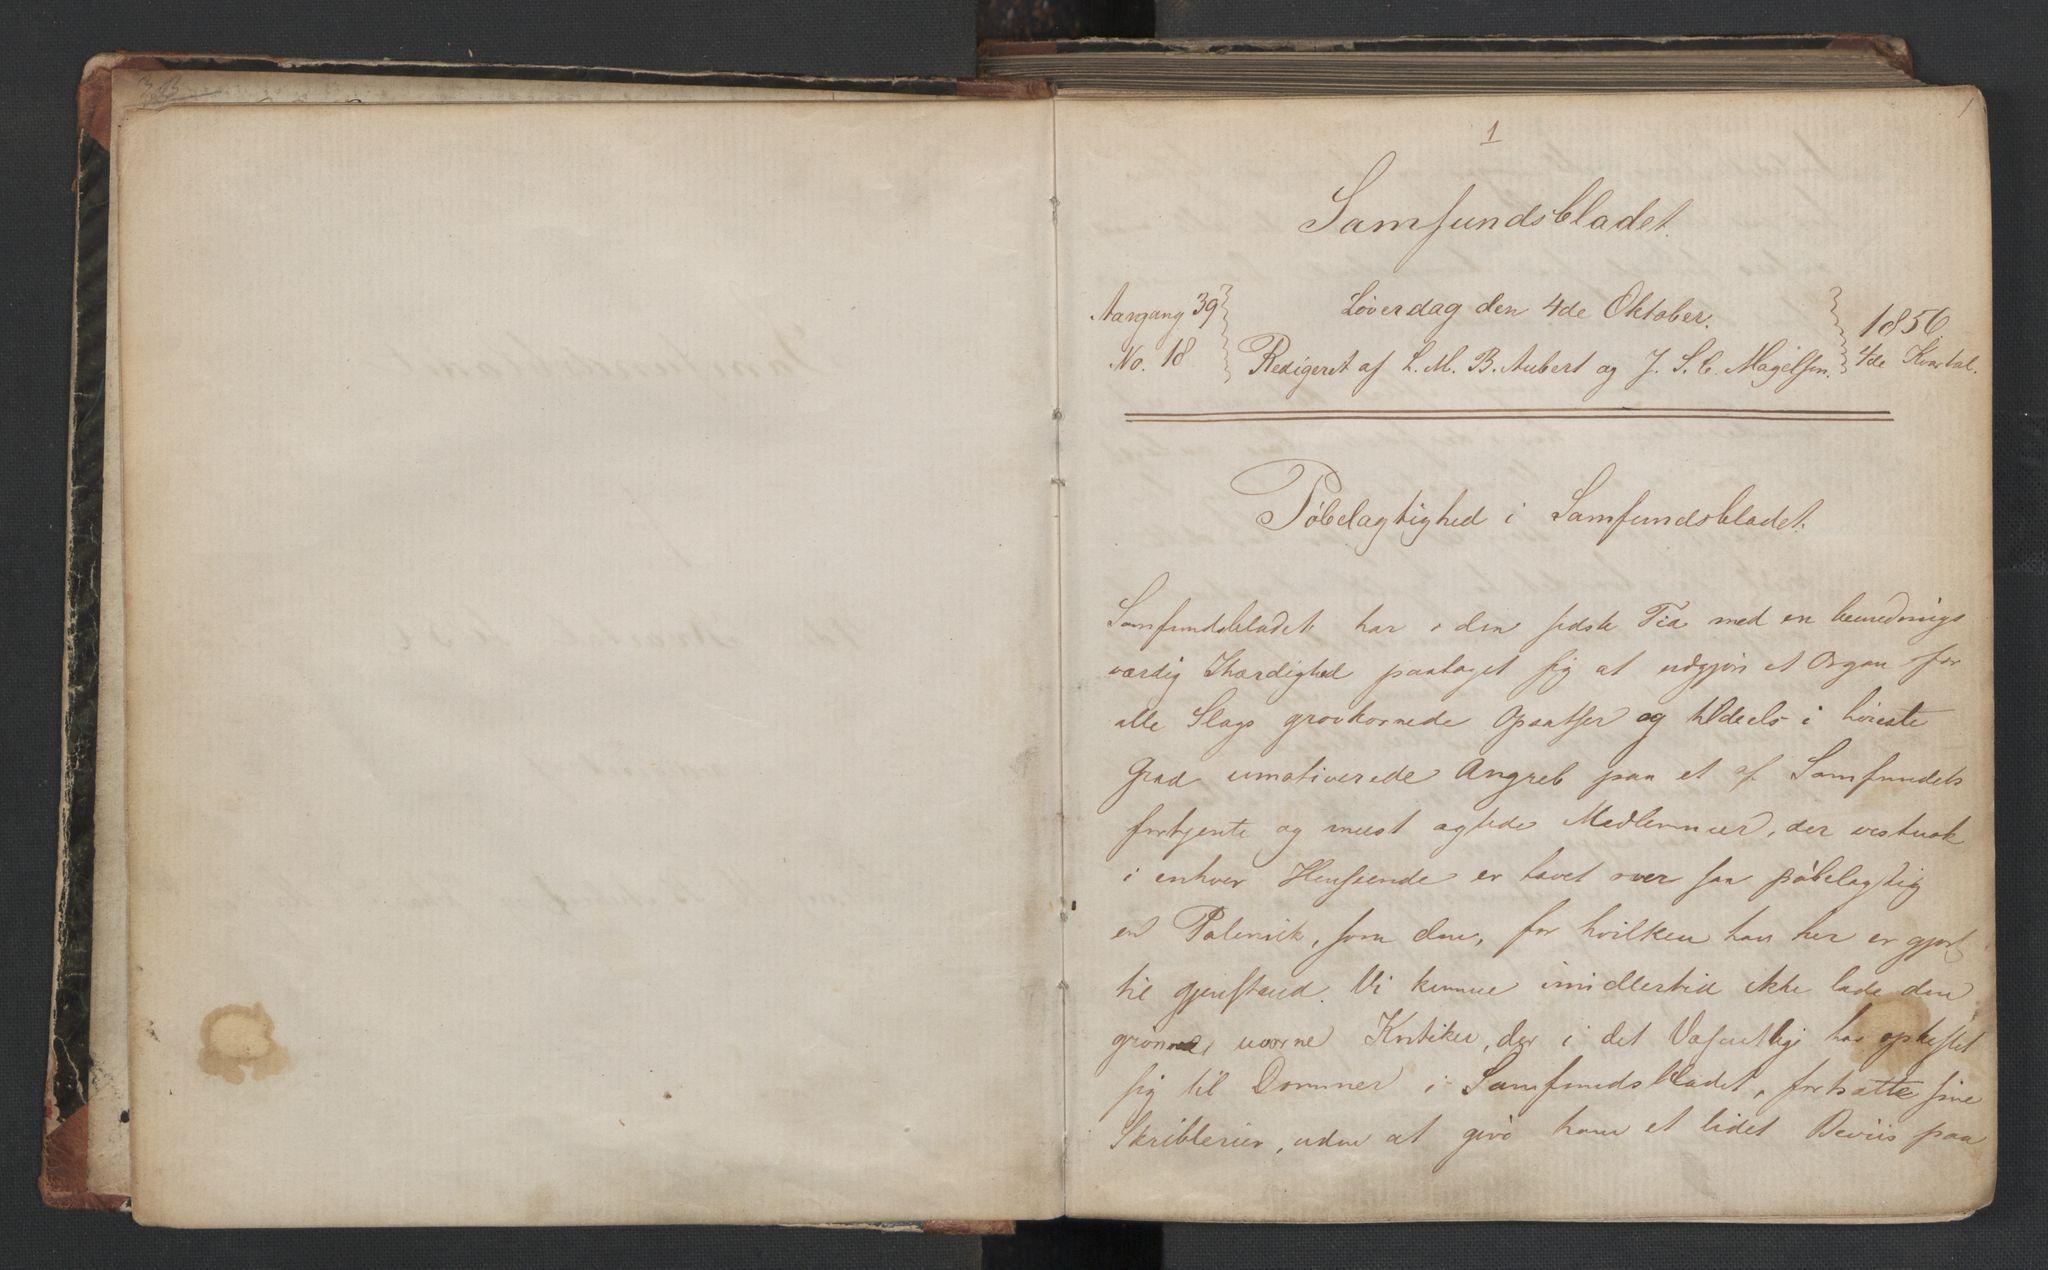 RA, Det Norske Studentersamfund, X/Xa/L0006, 1856-1857, s. 4